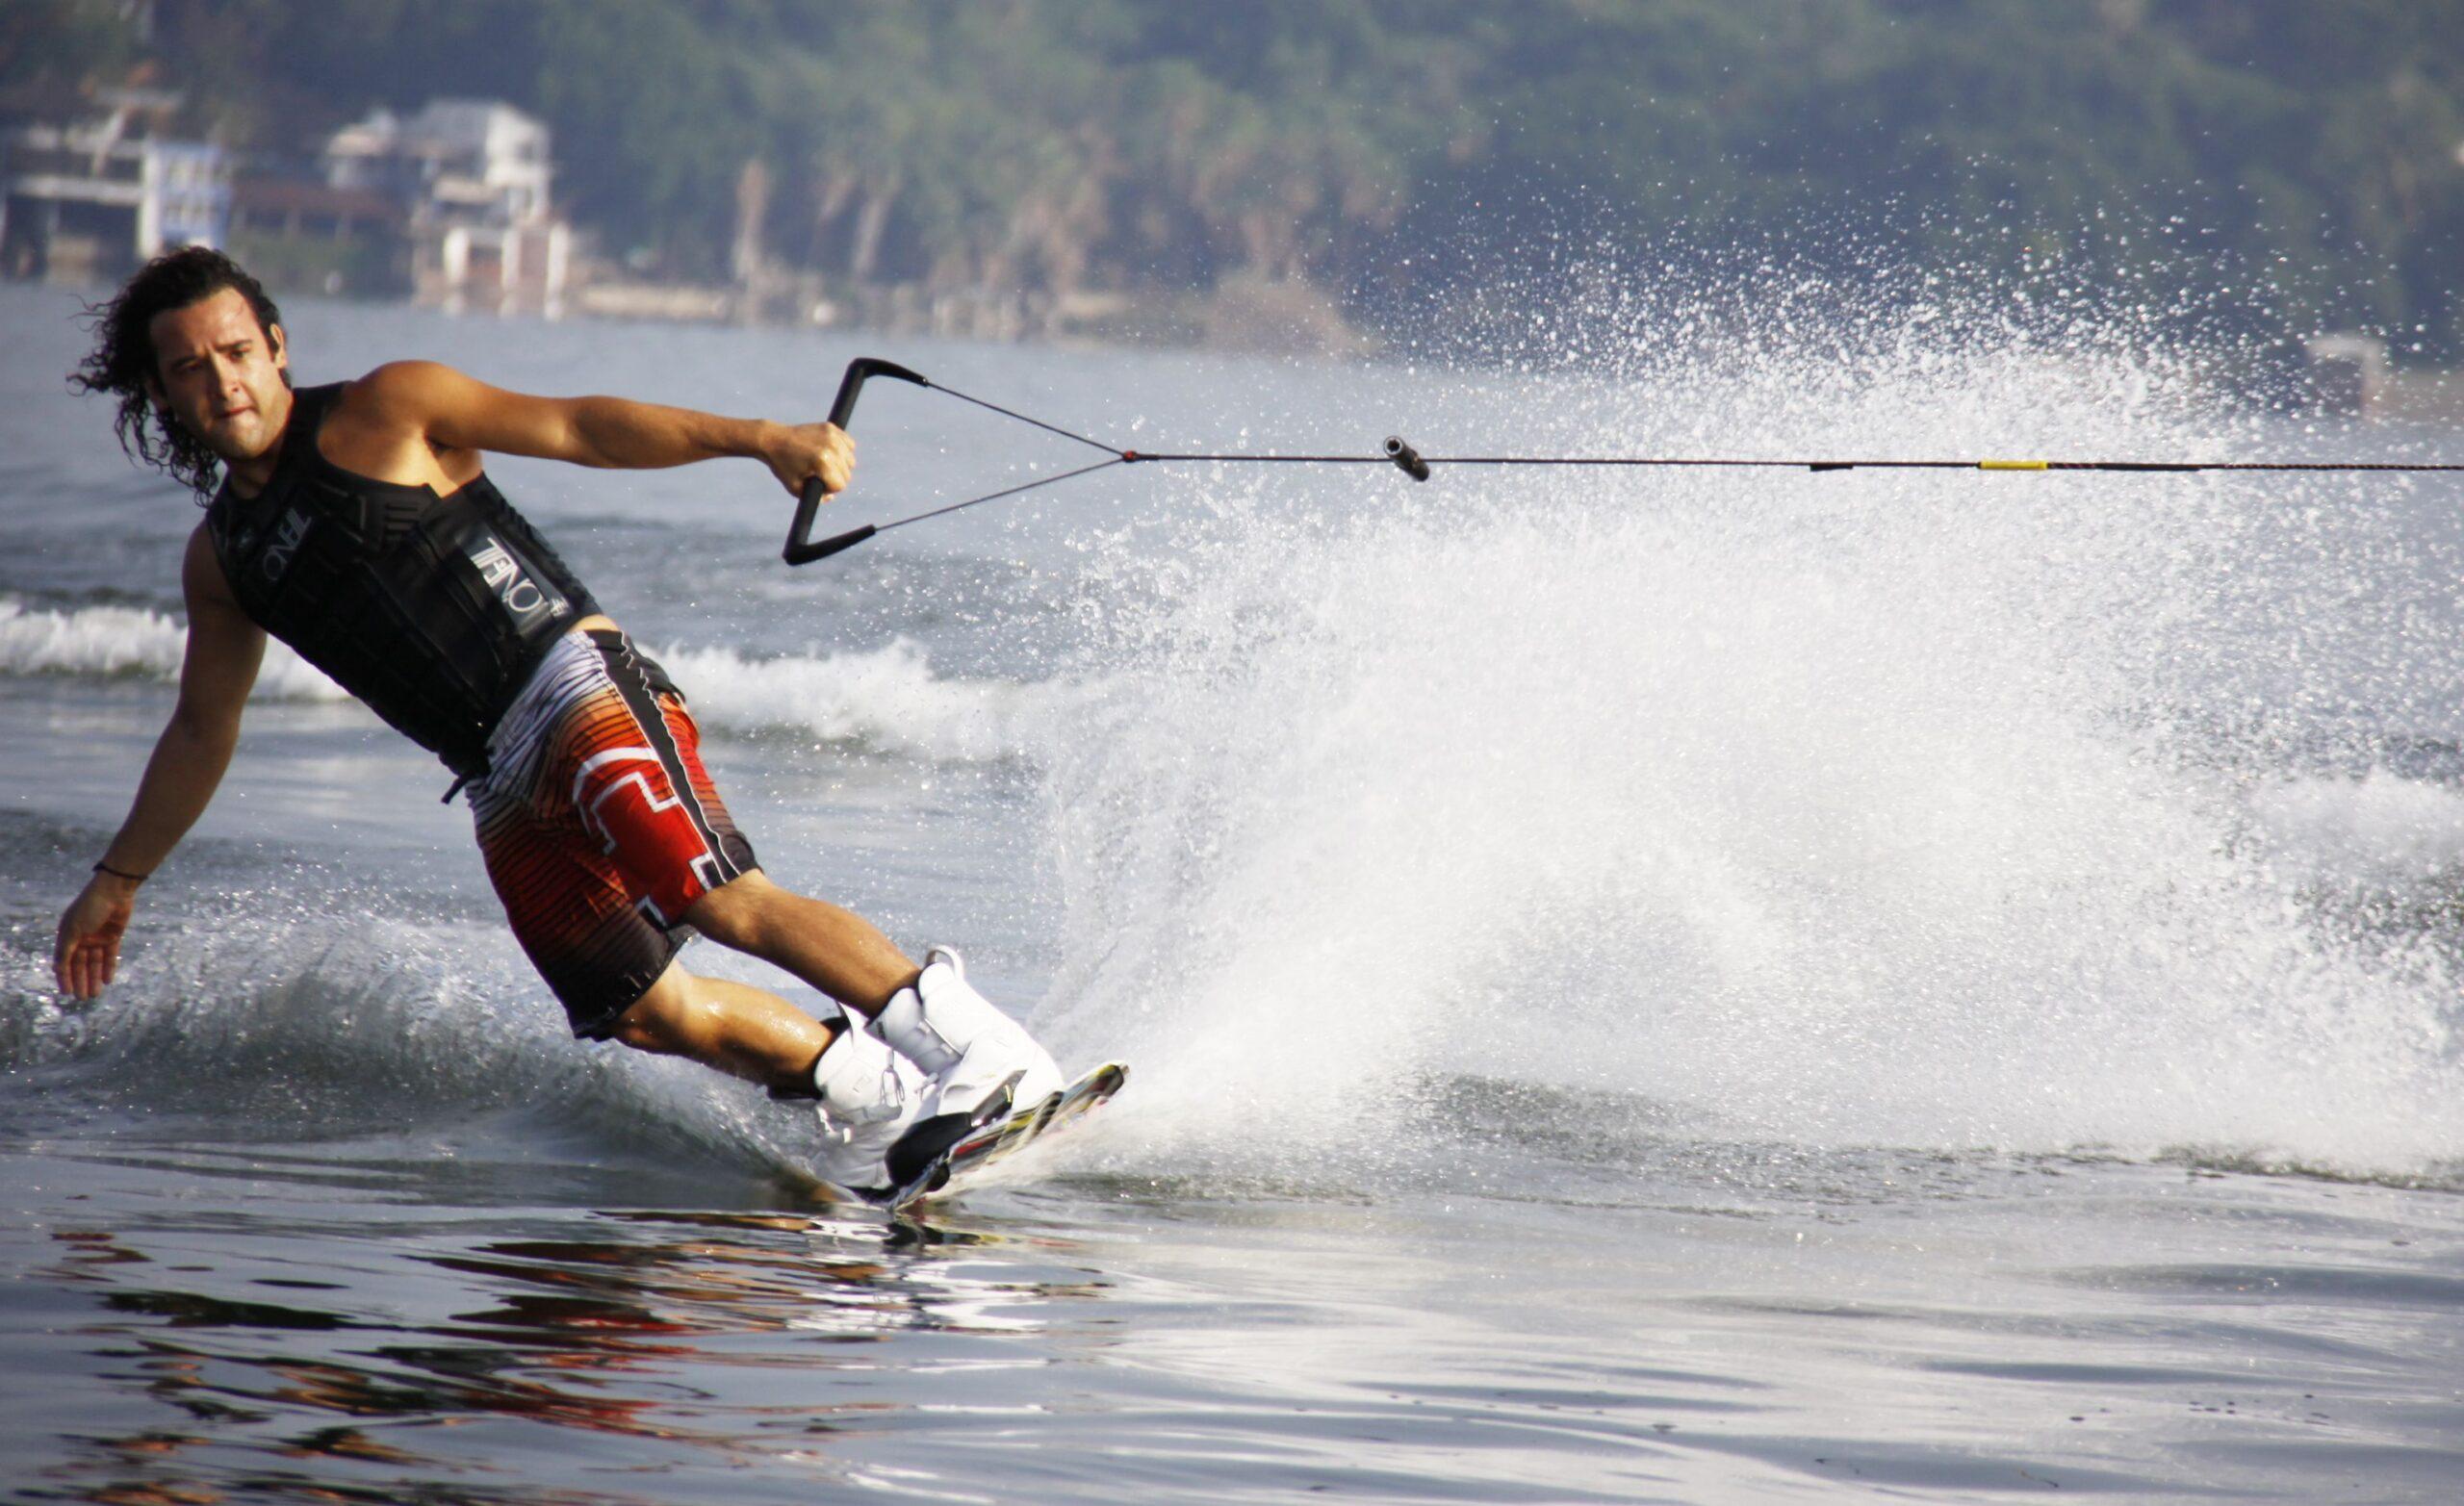 trip to wakeboard wakeboarding travel planner app